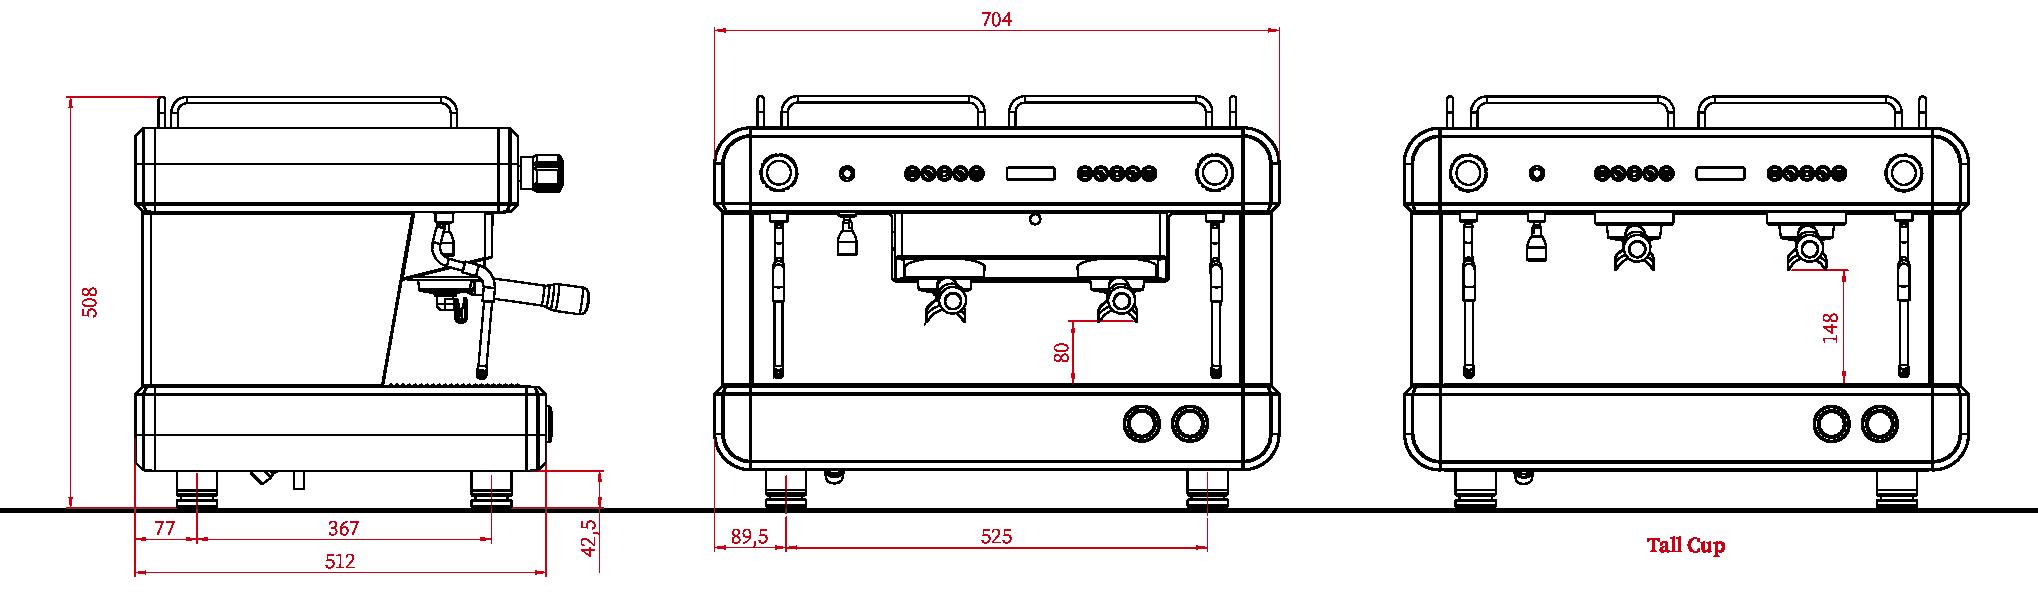 CC200 Technical Drawing